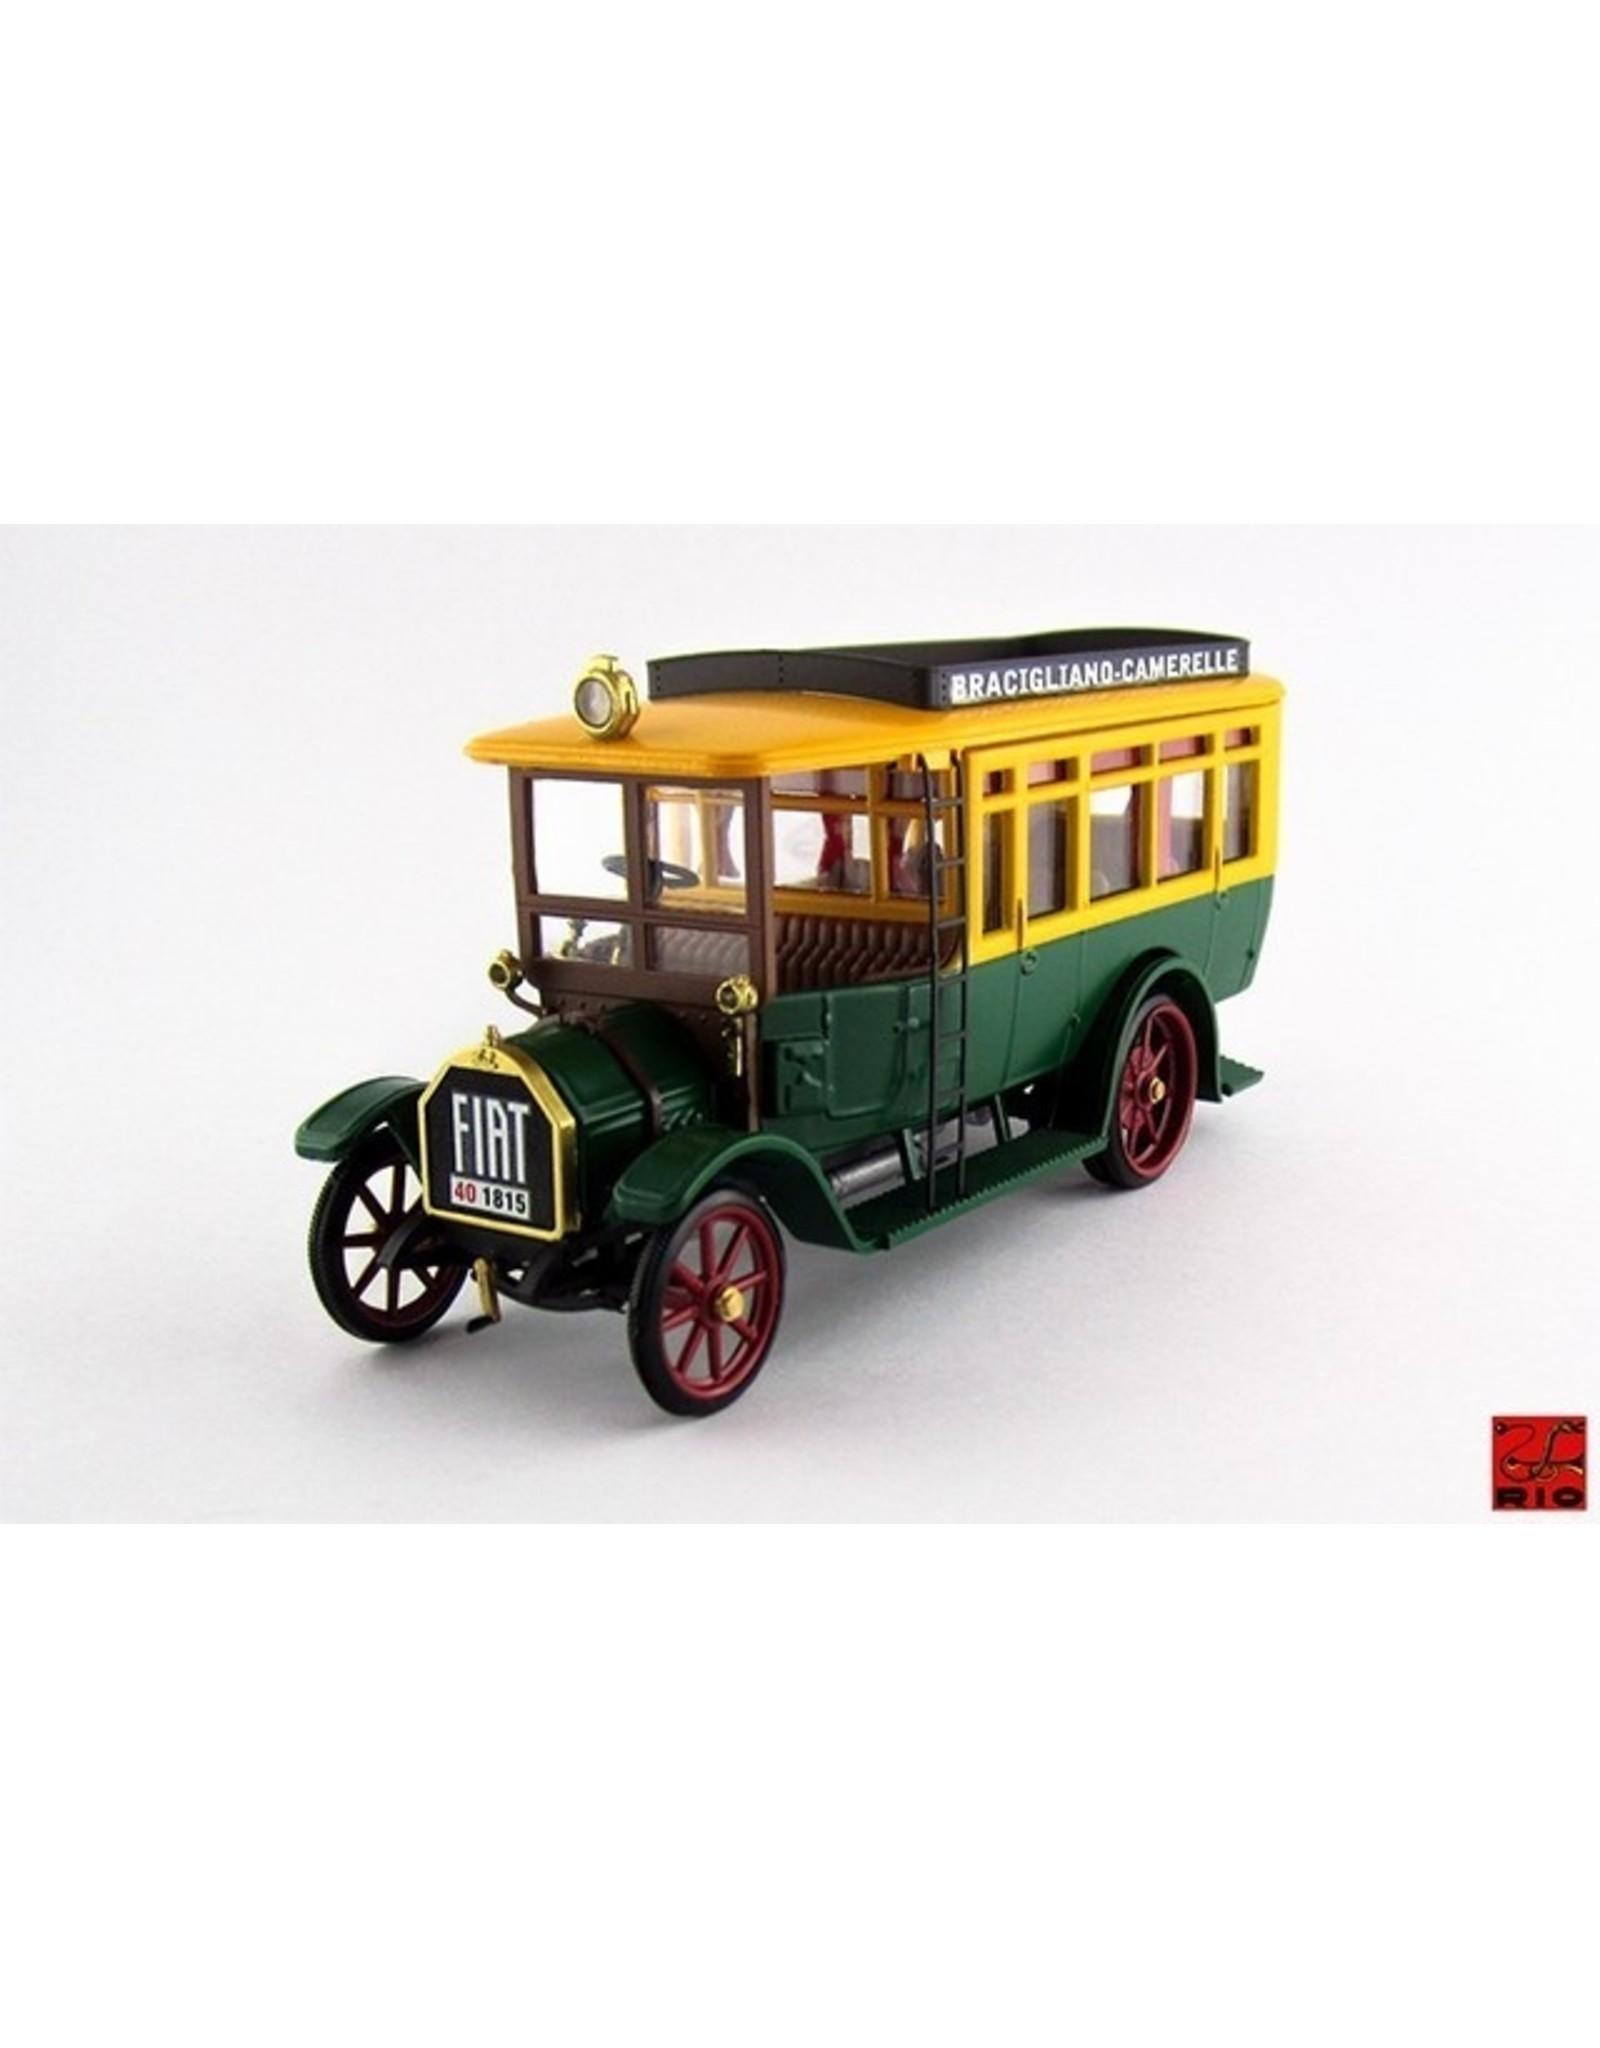 Fiat Fiat 18BL Autobus Bracigiano-Camarelle 1916 - 1:43 - Rio